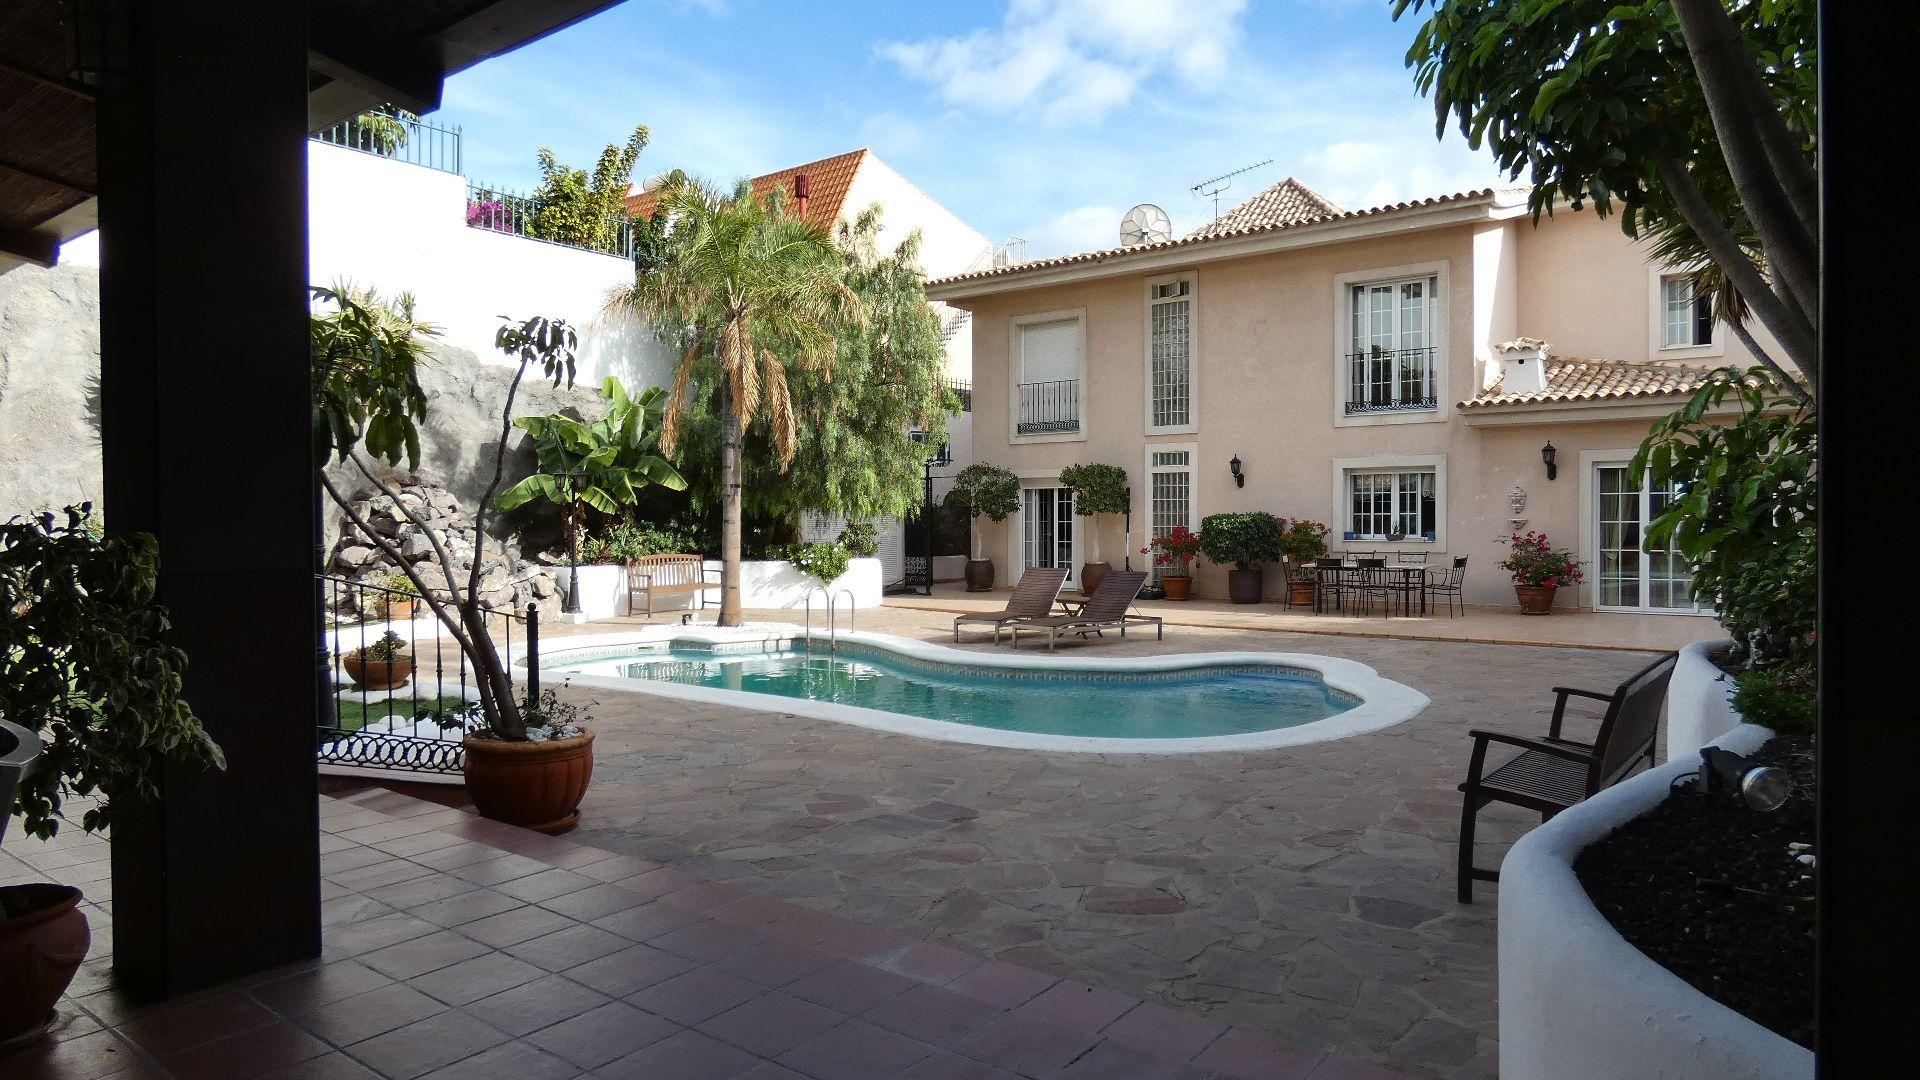 Casa / Chalet en Santa Cruz de Tenerife, RADAZUL, alquiler